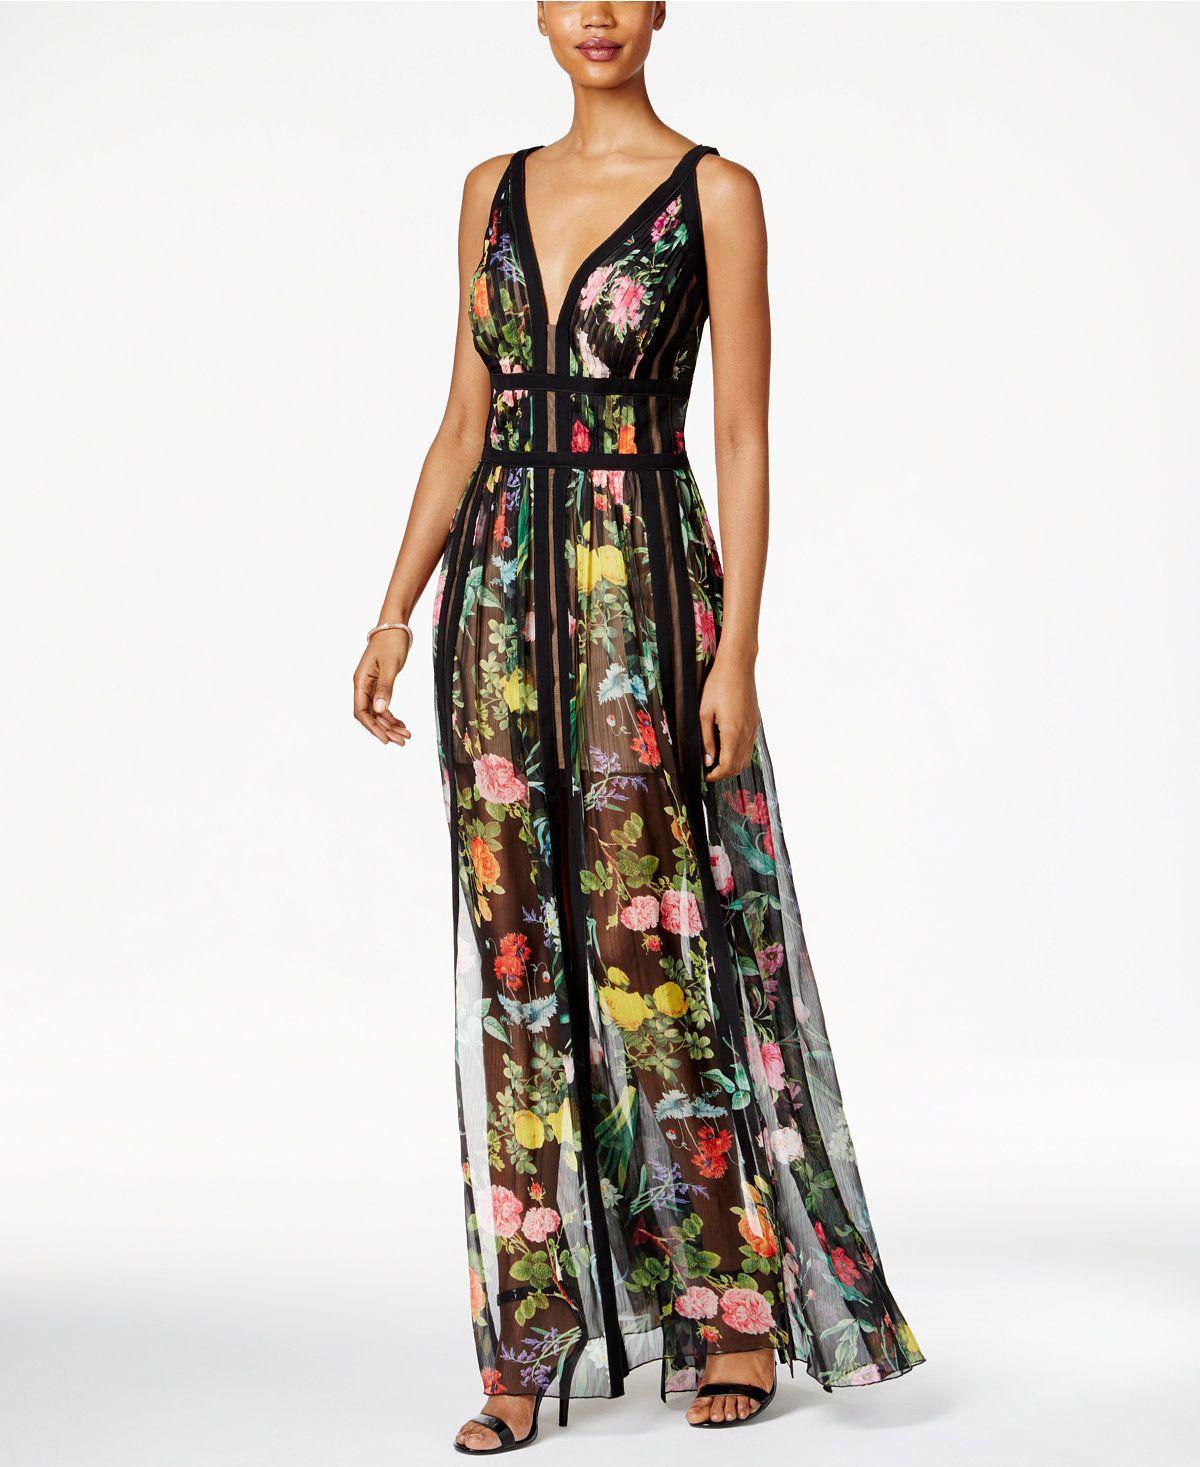 0ee7fa9841e2 Tadashi Shoji Floral-Print A-Line Gown - Dresses - Women - Macy s ...